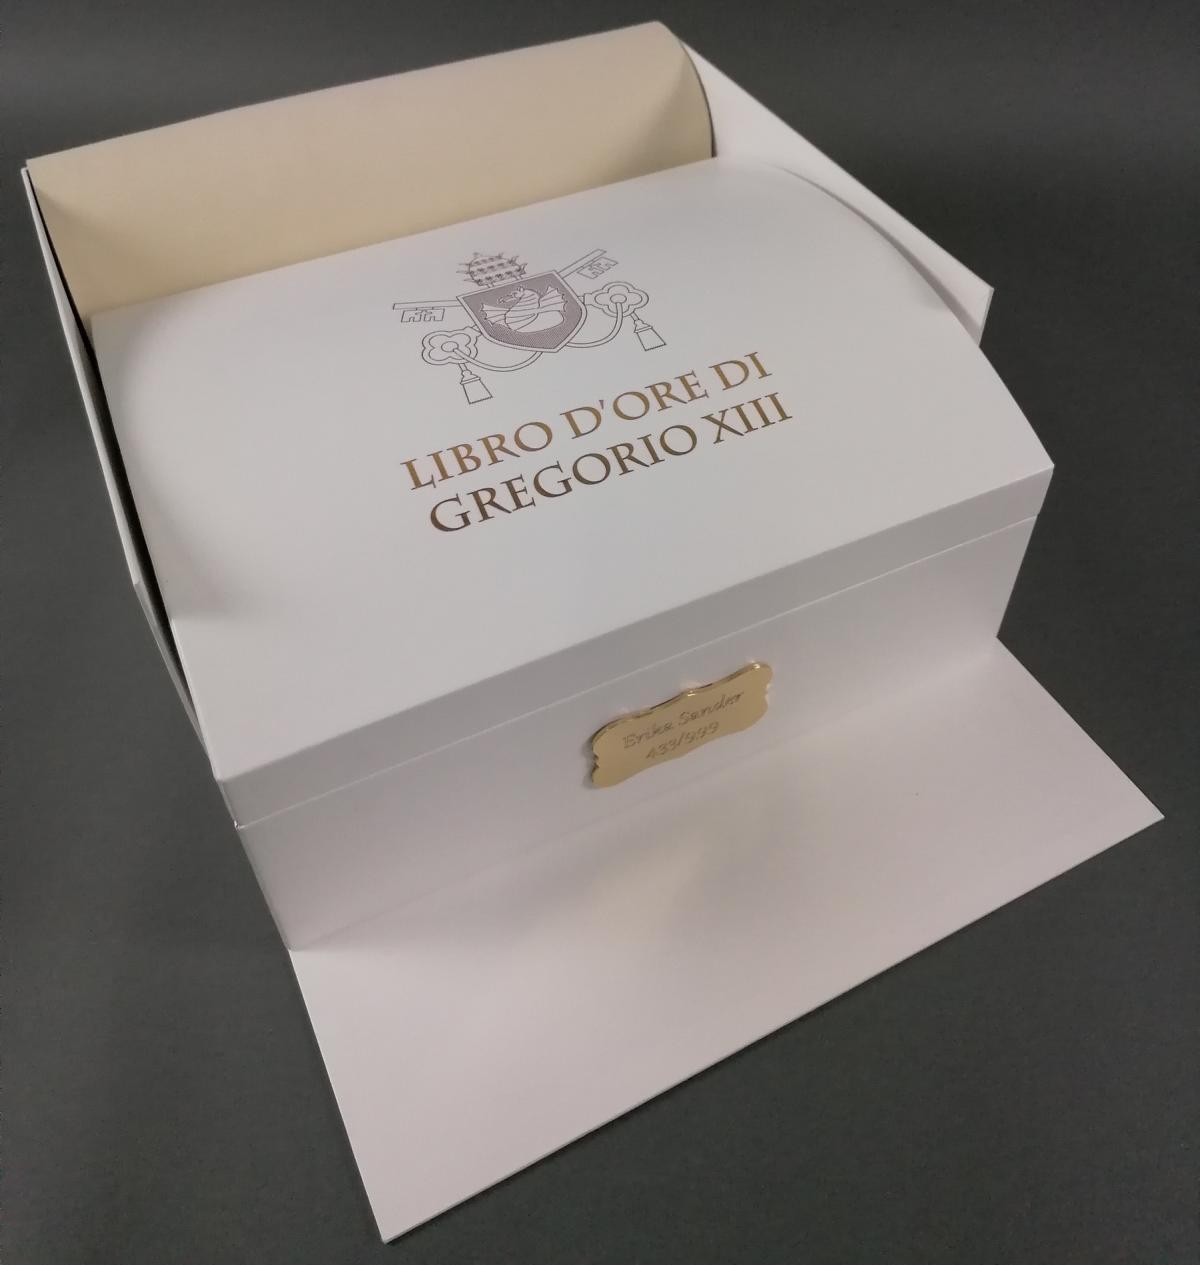 Faksimile Edition. Libro d'Ore di Gregorio XIII – Artcodex